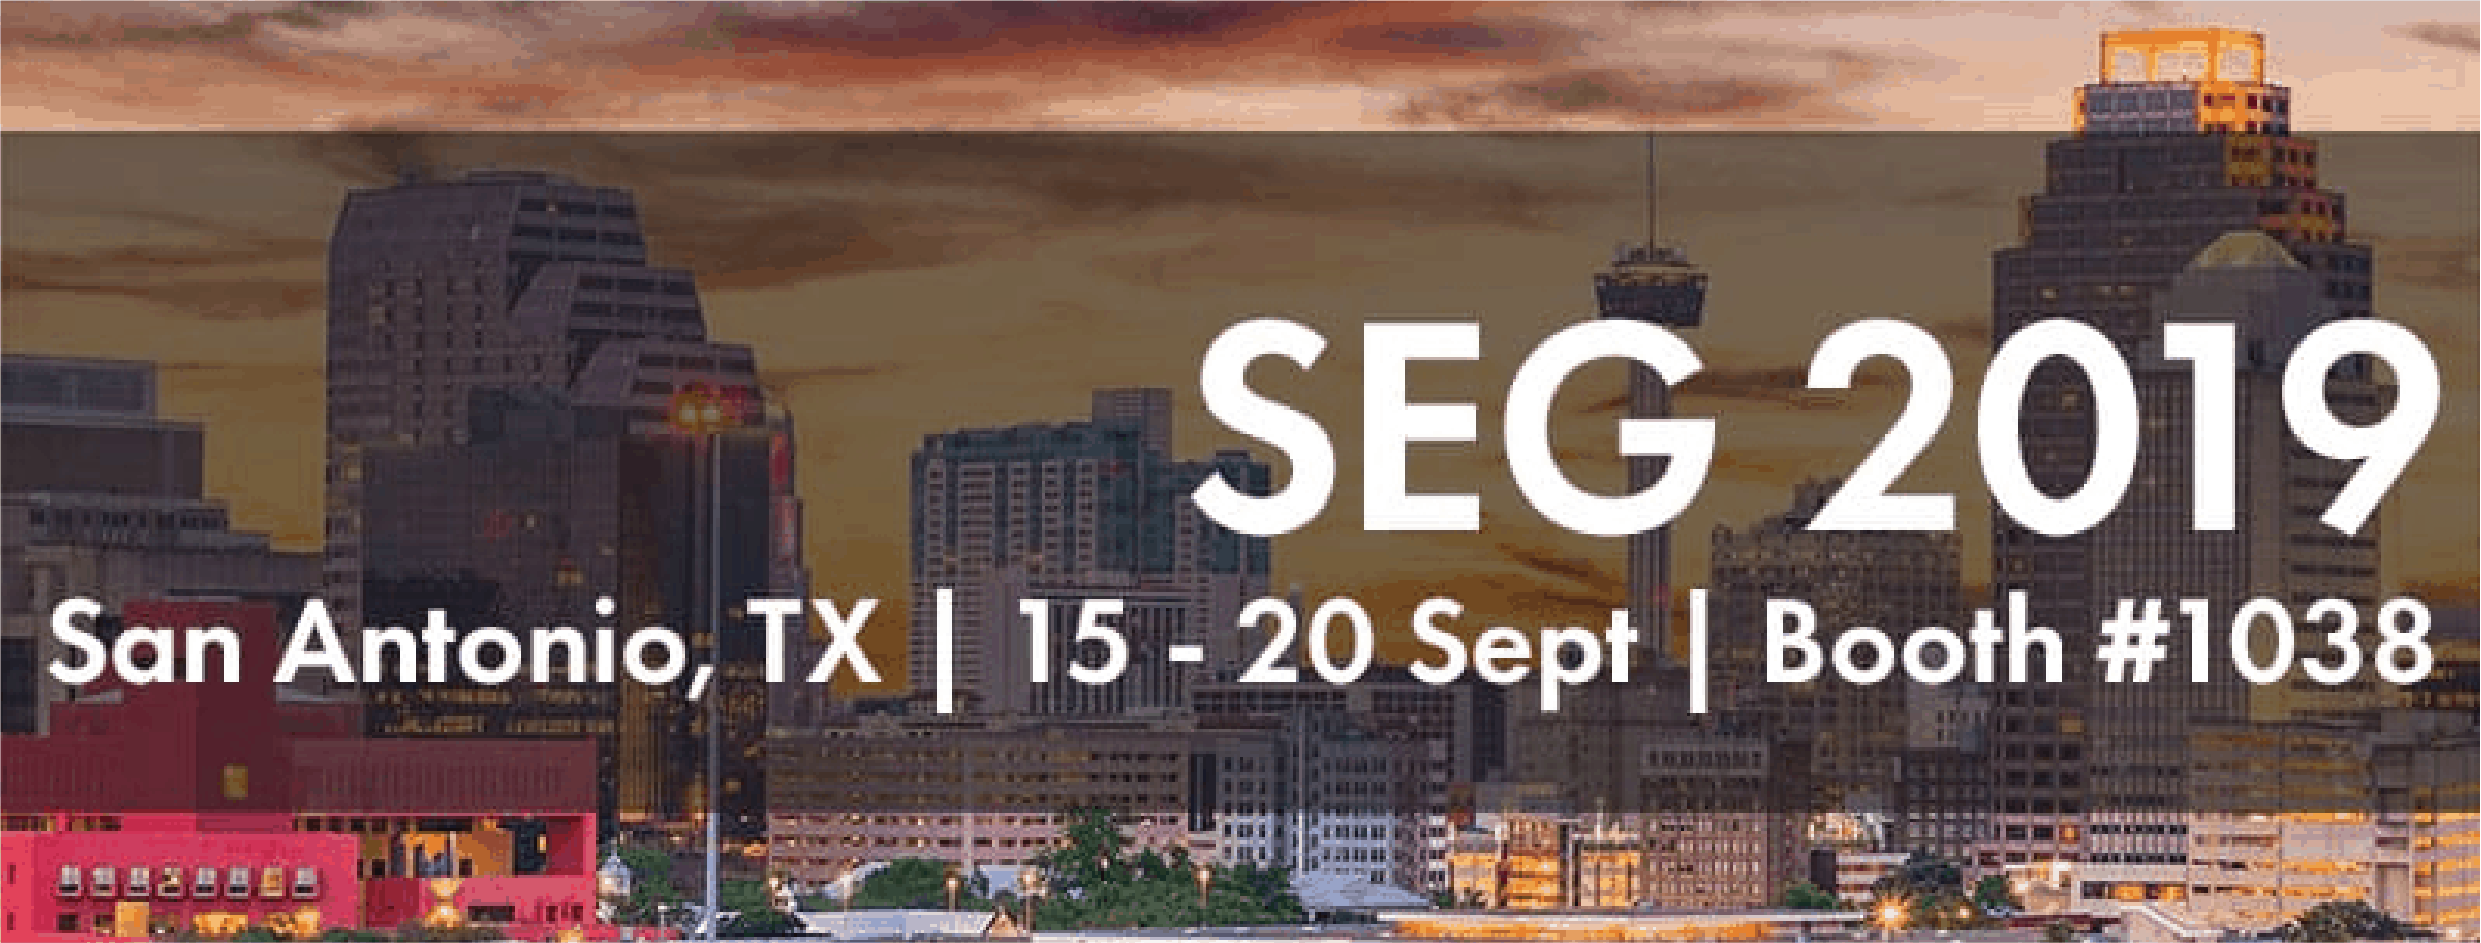 SEG 2019 Social Link Image